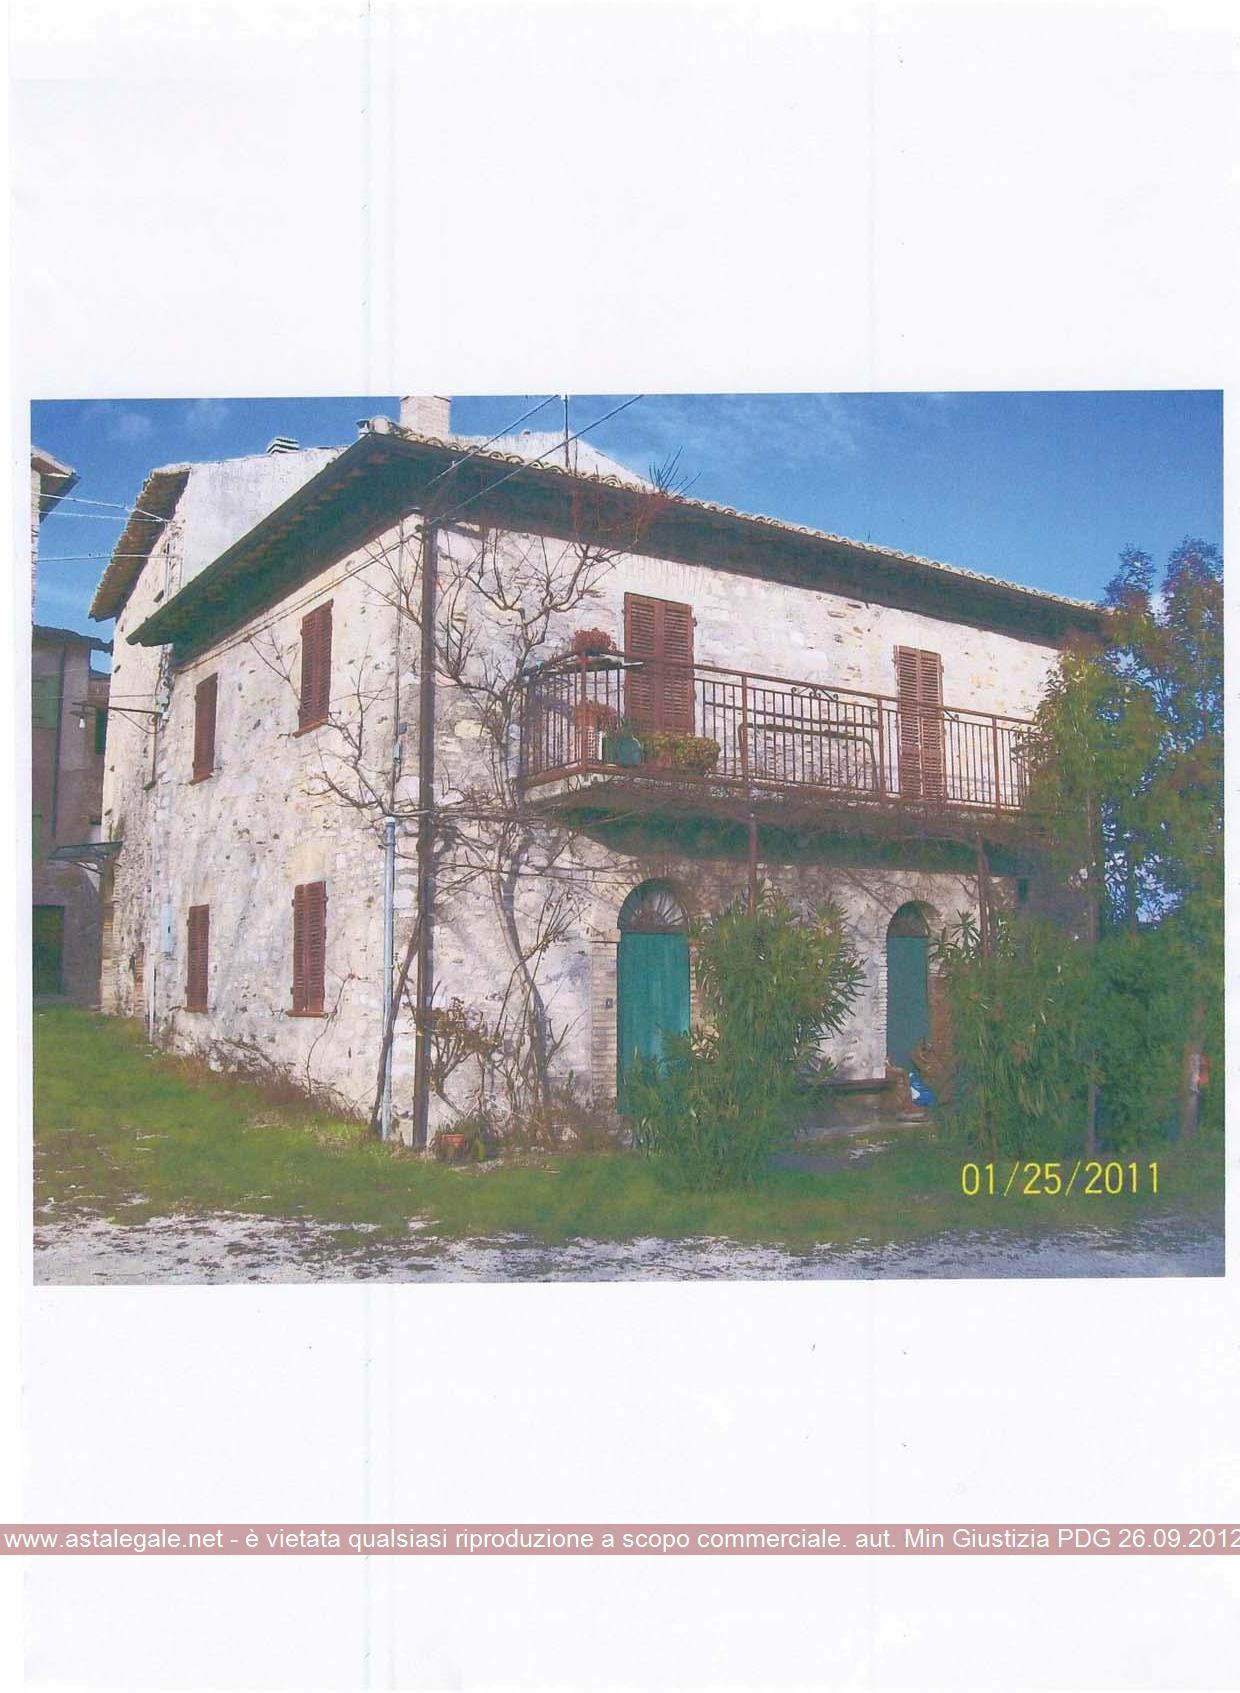 Spoleto (PG) Localita' Balduini snc